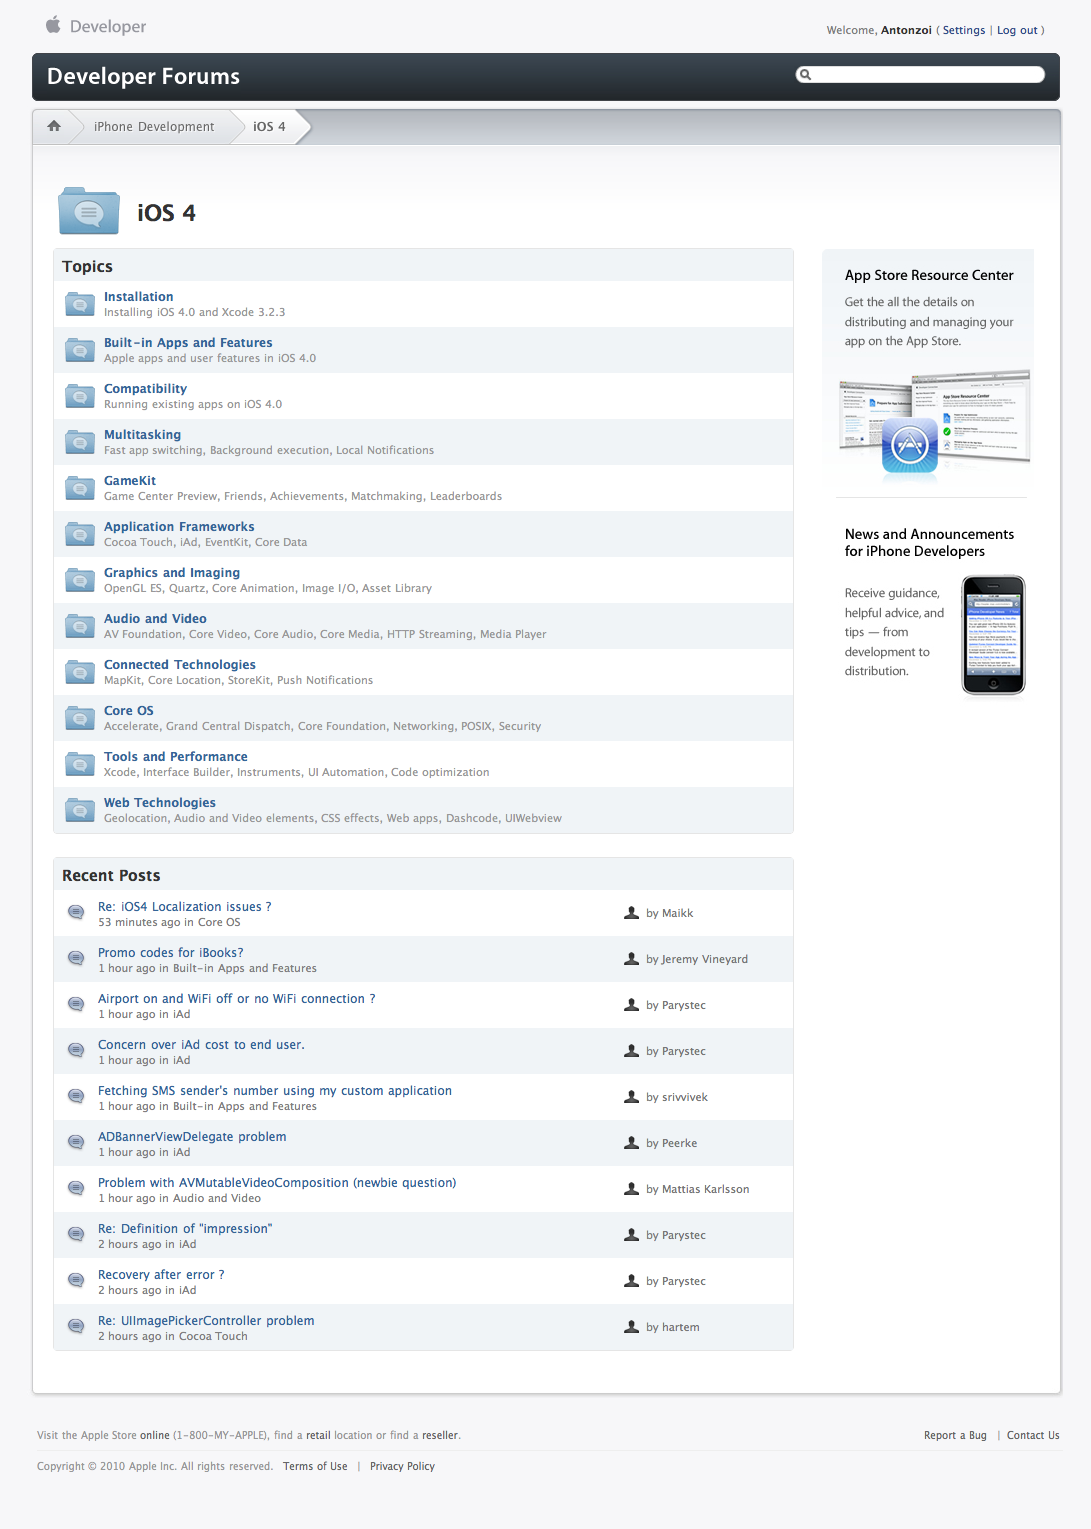 Developer Forums: iOS 4 (05 07 2010) | Apple com sick